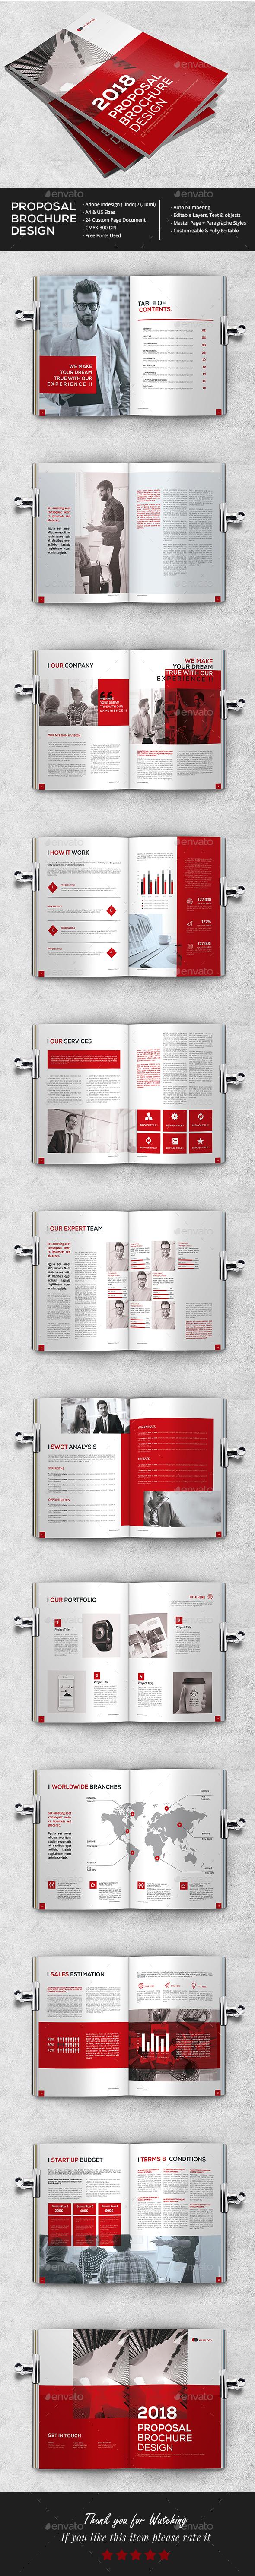 Clean Proposal Brochure - Brochures Print Templates